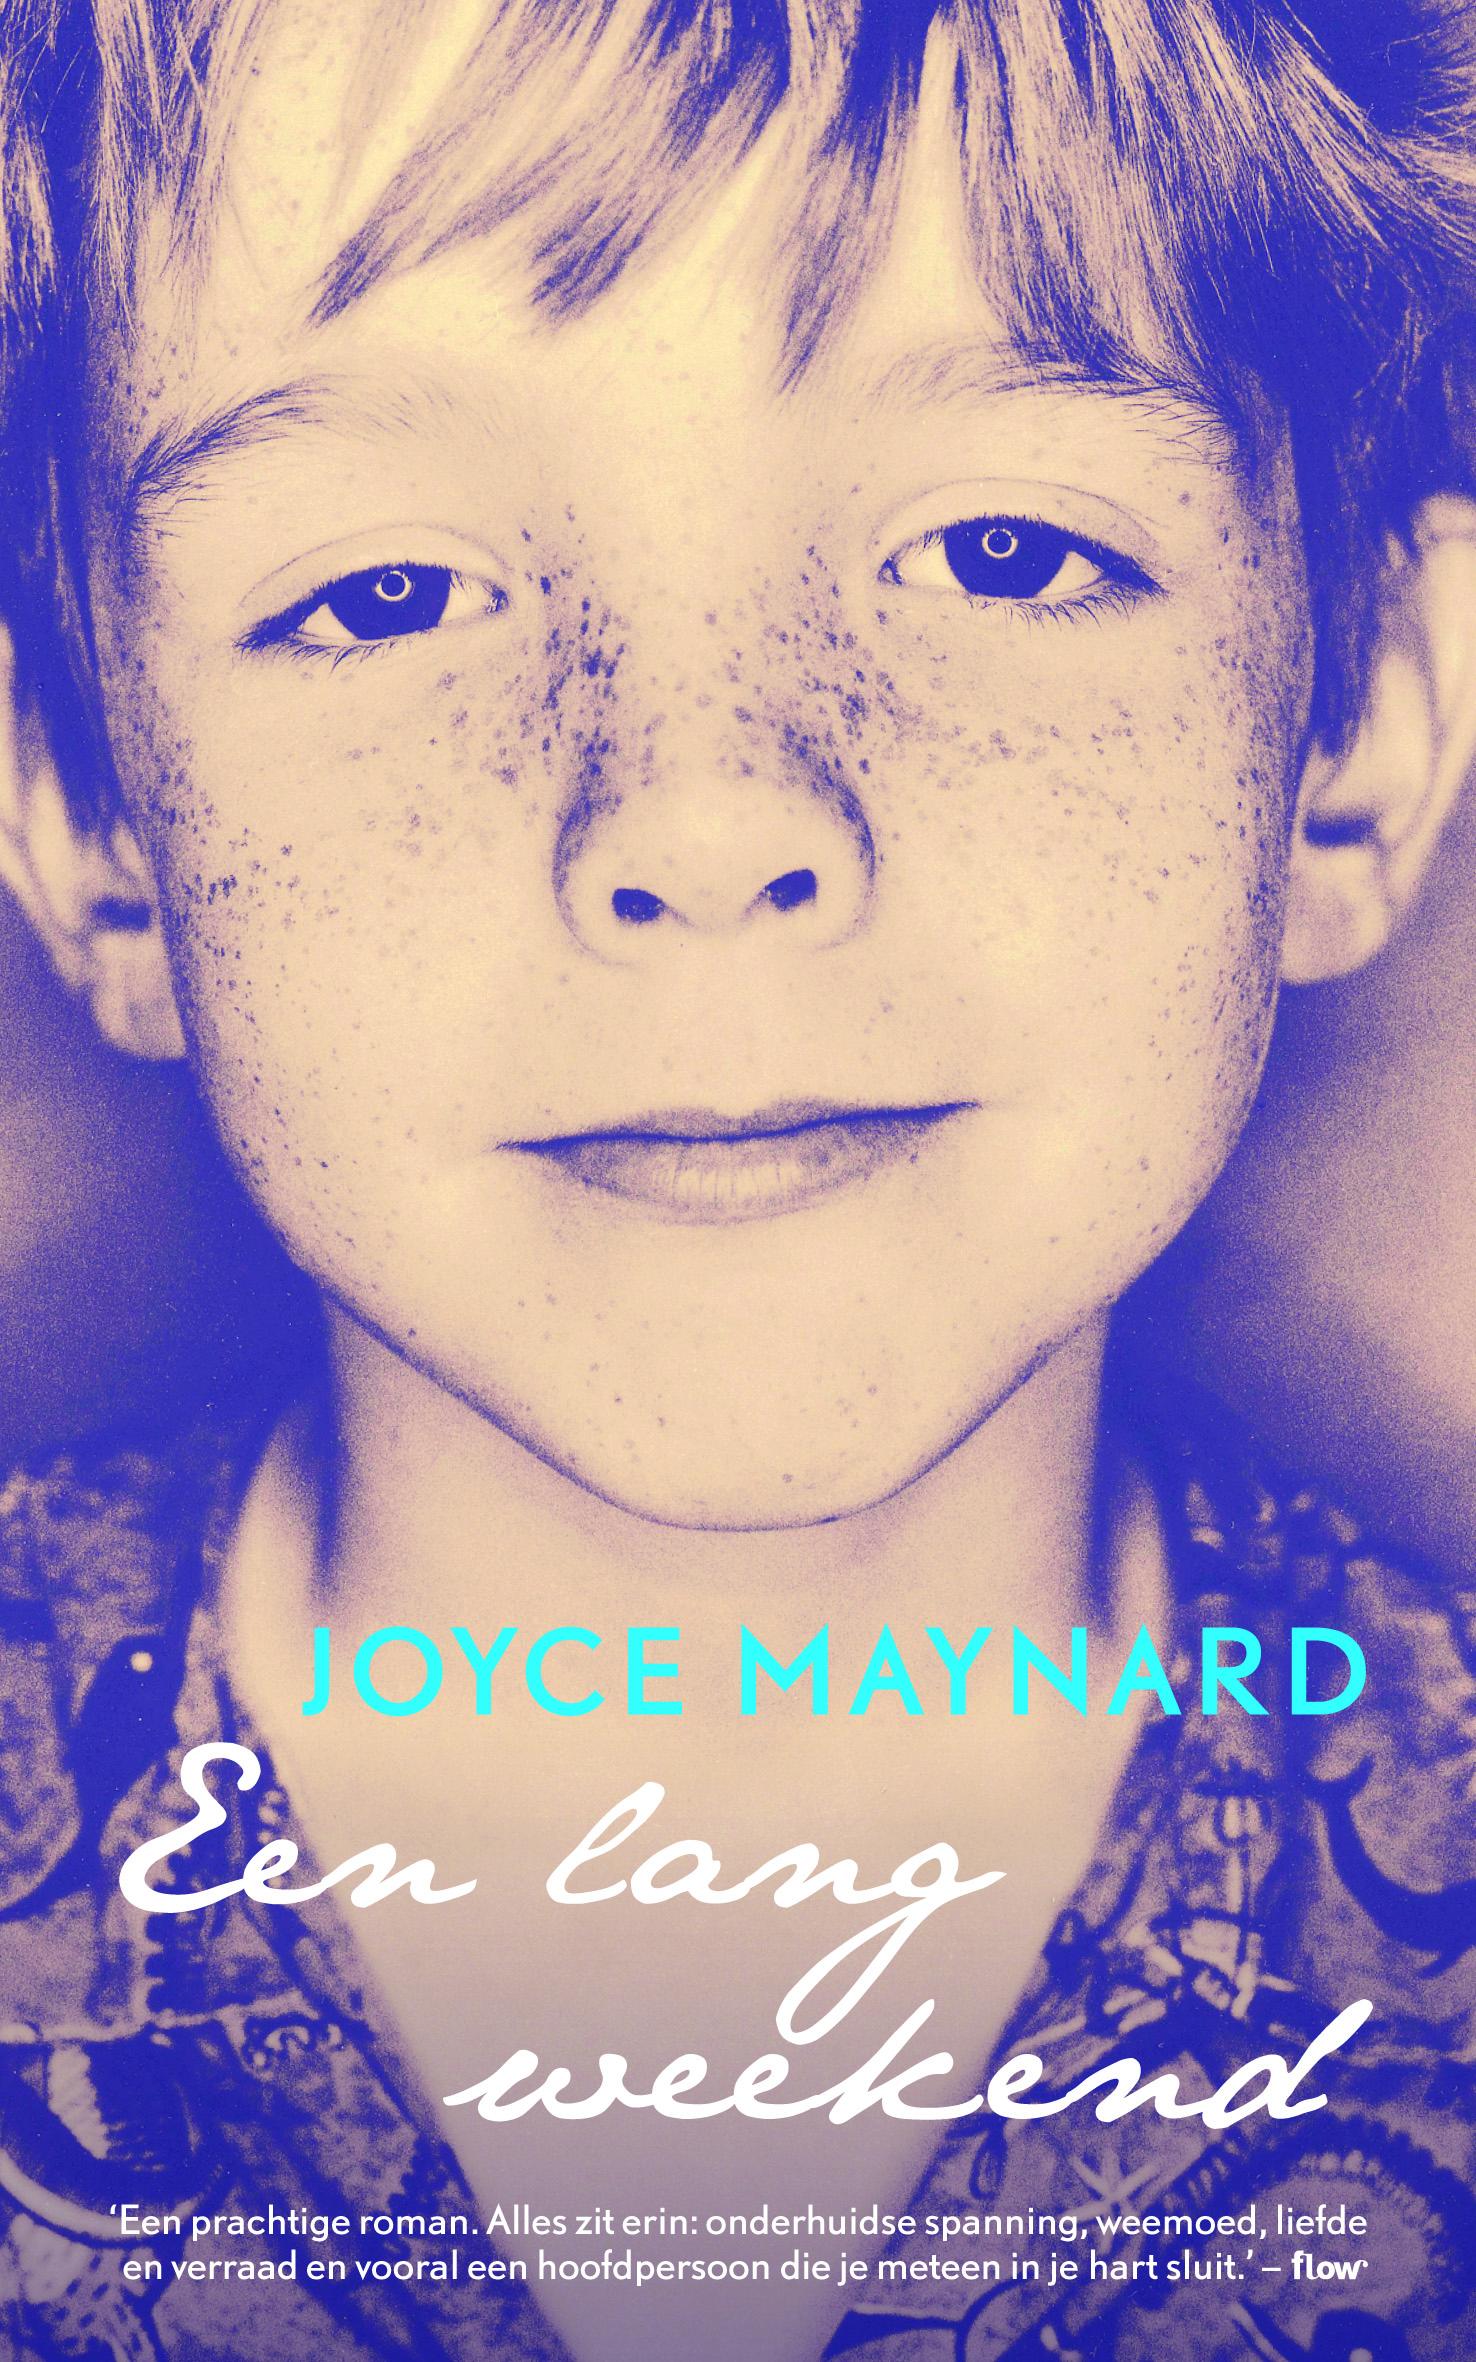 Een lang weekend – Joyce Maynard